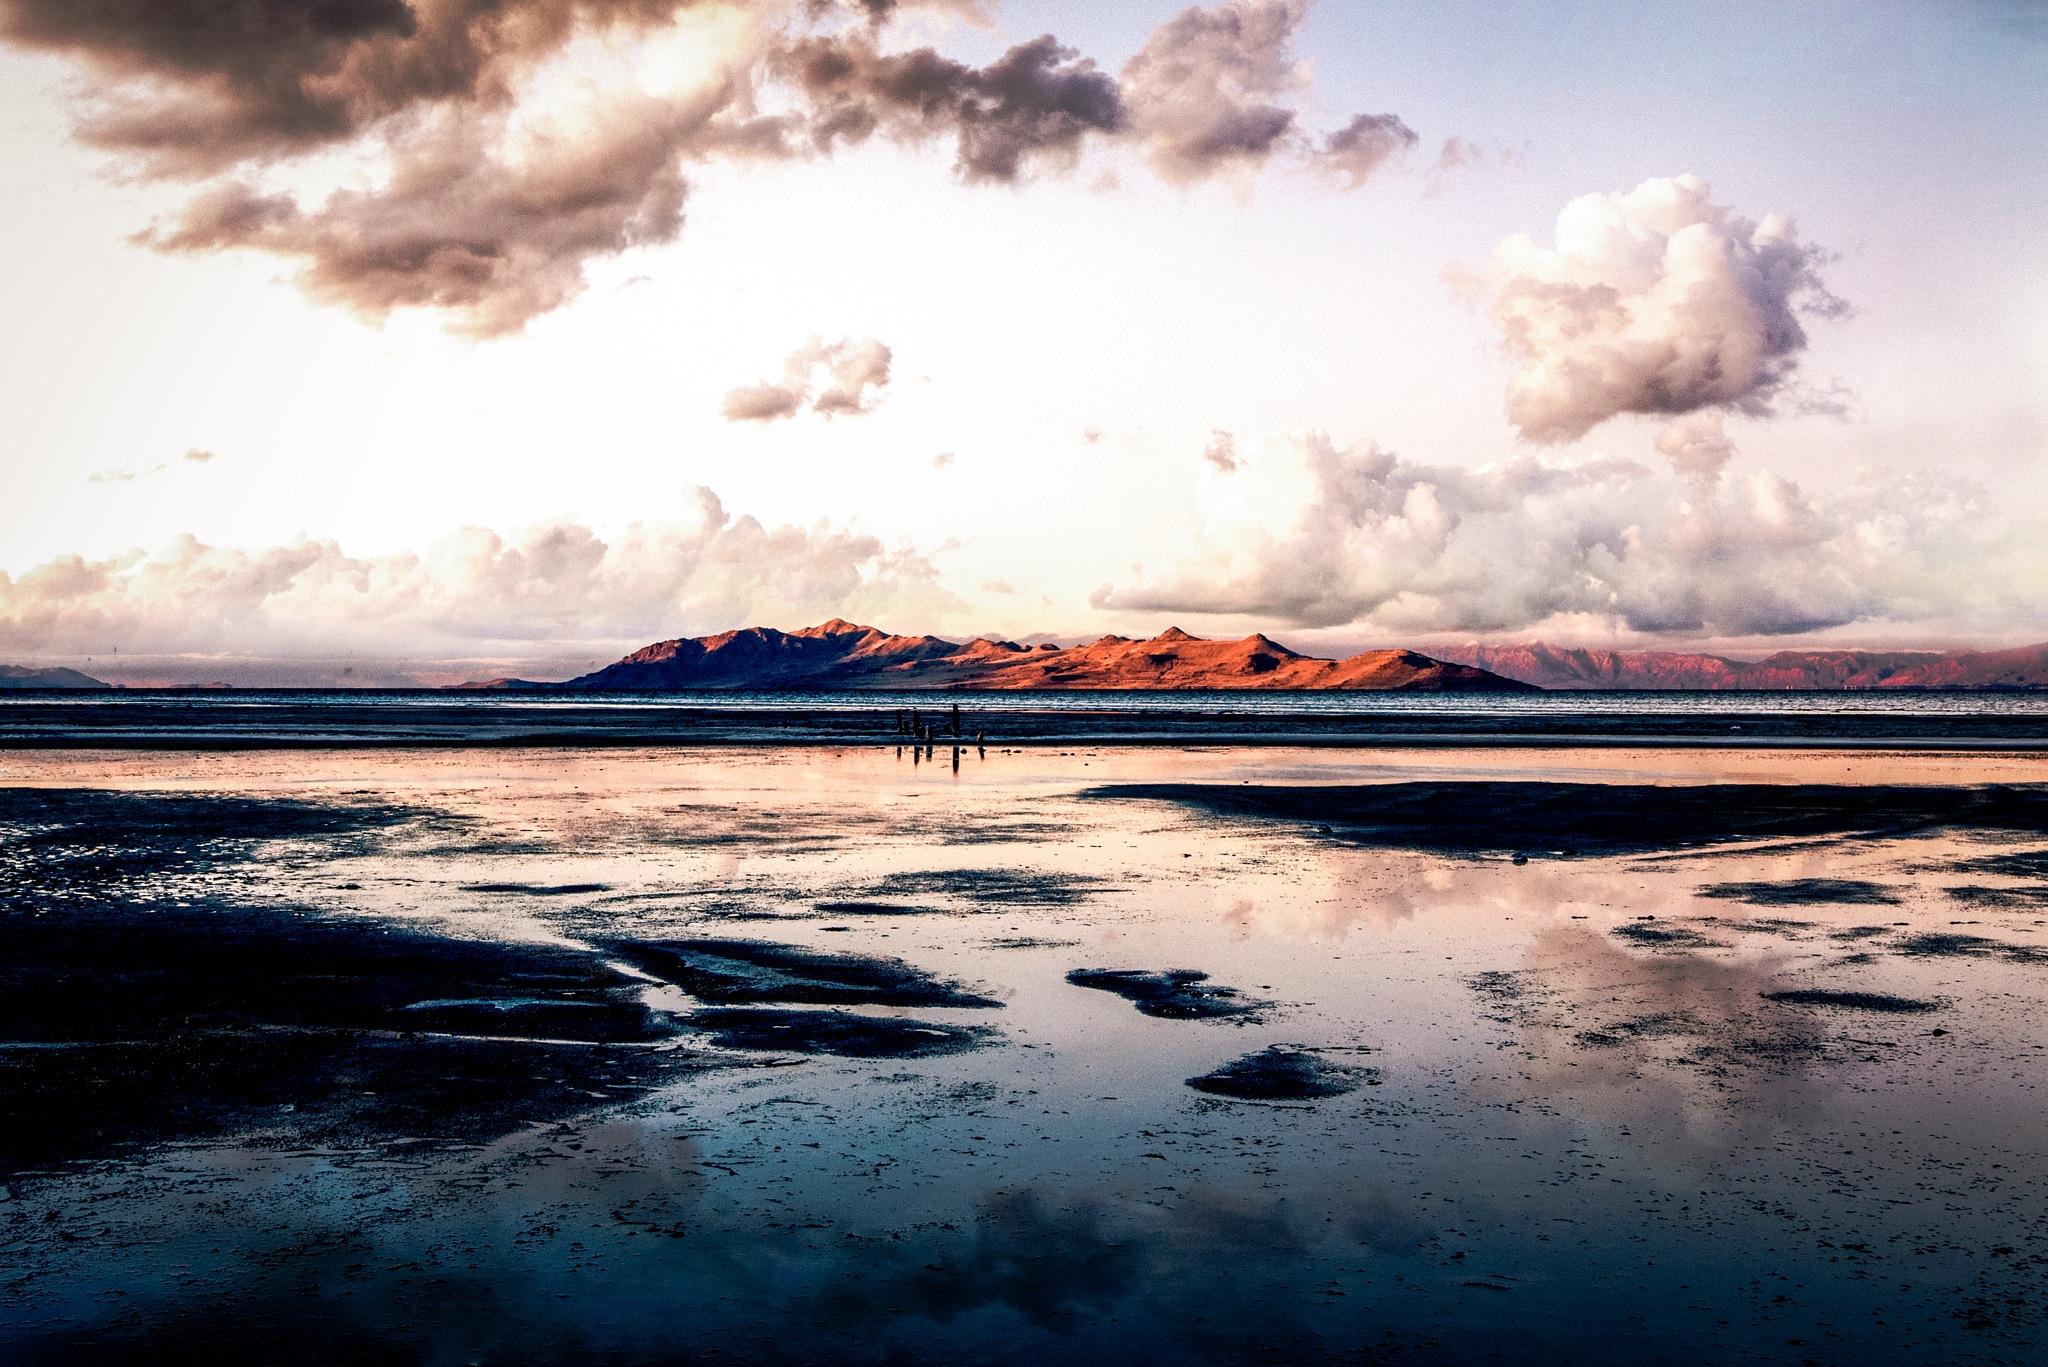 Mountains on the Otherside by Jordan M. Lomibao